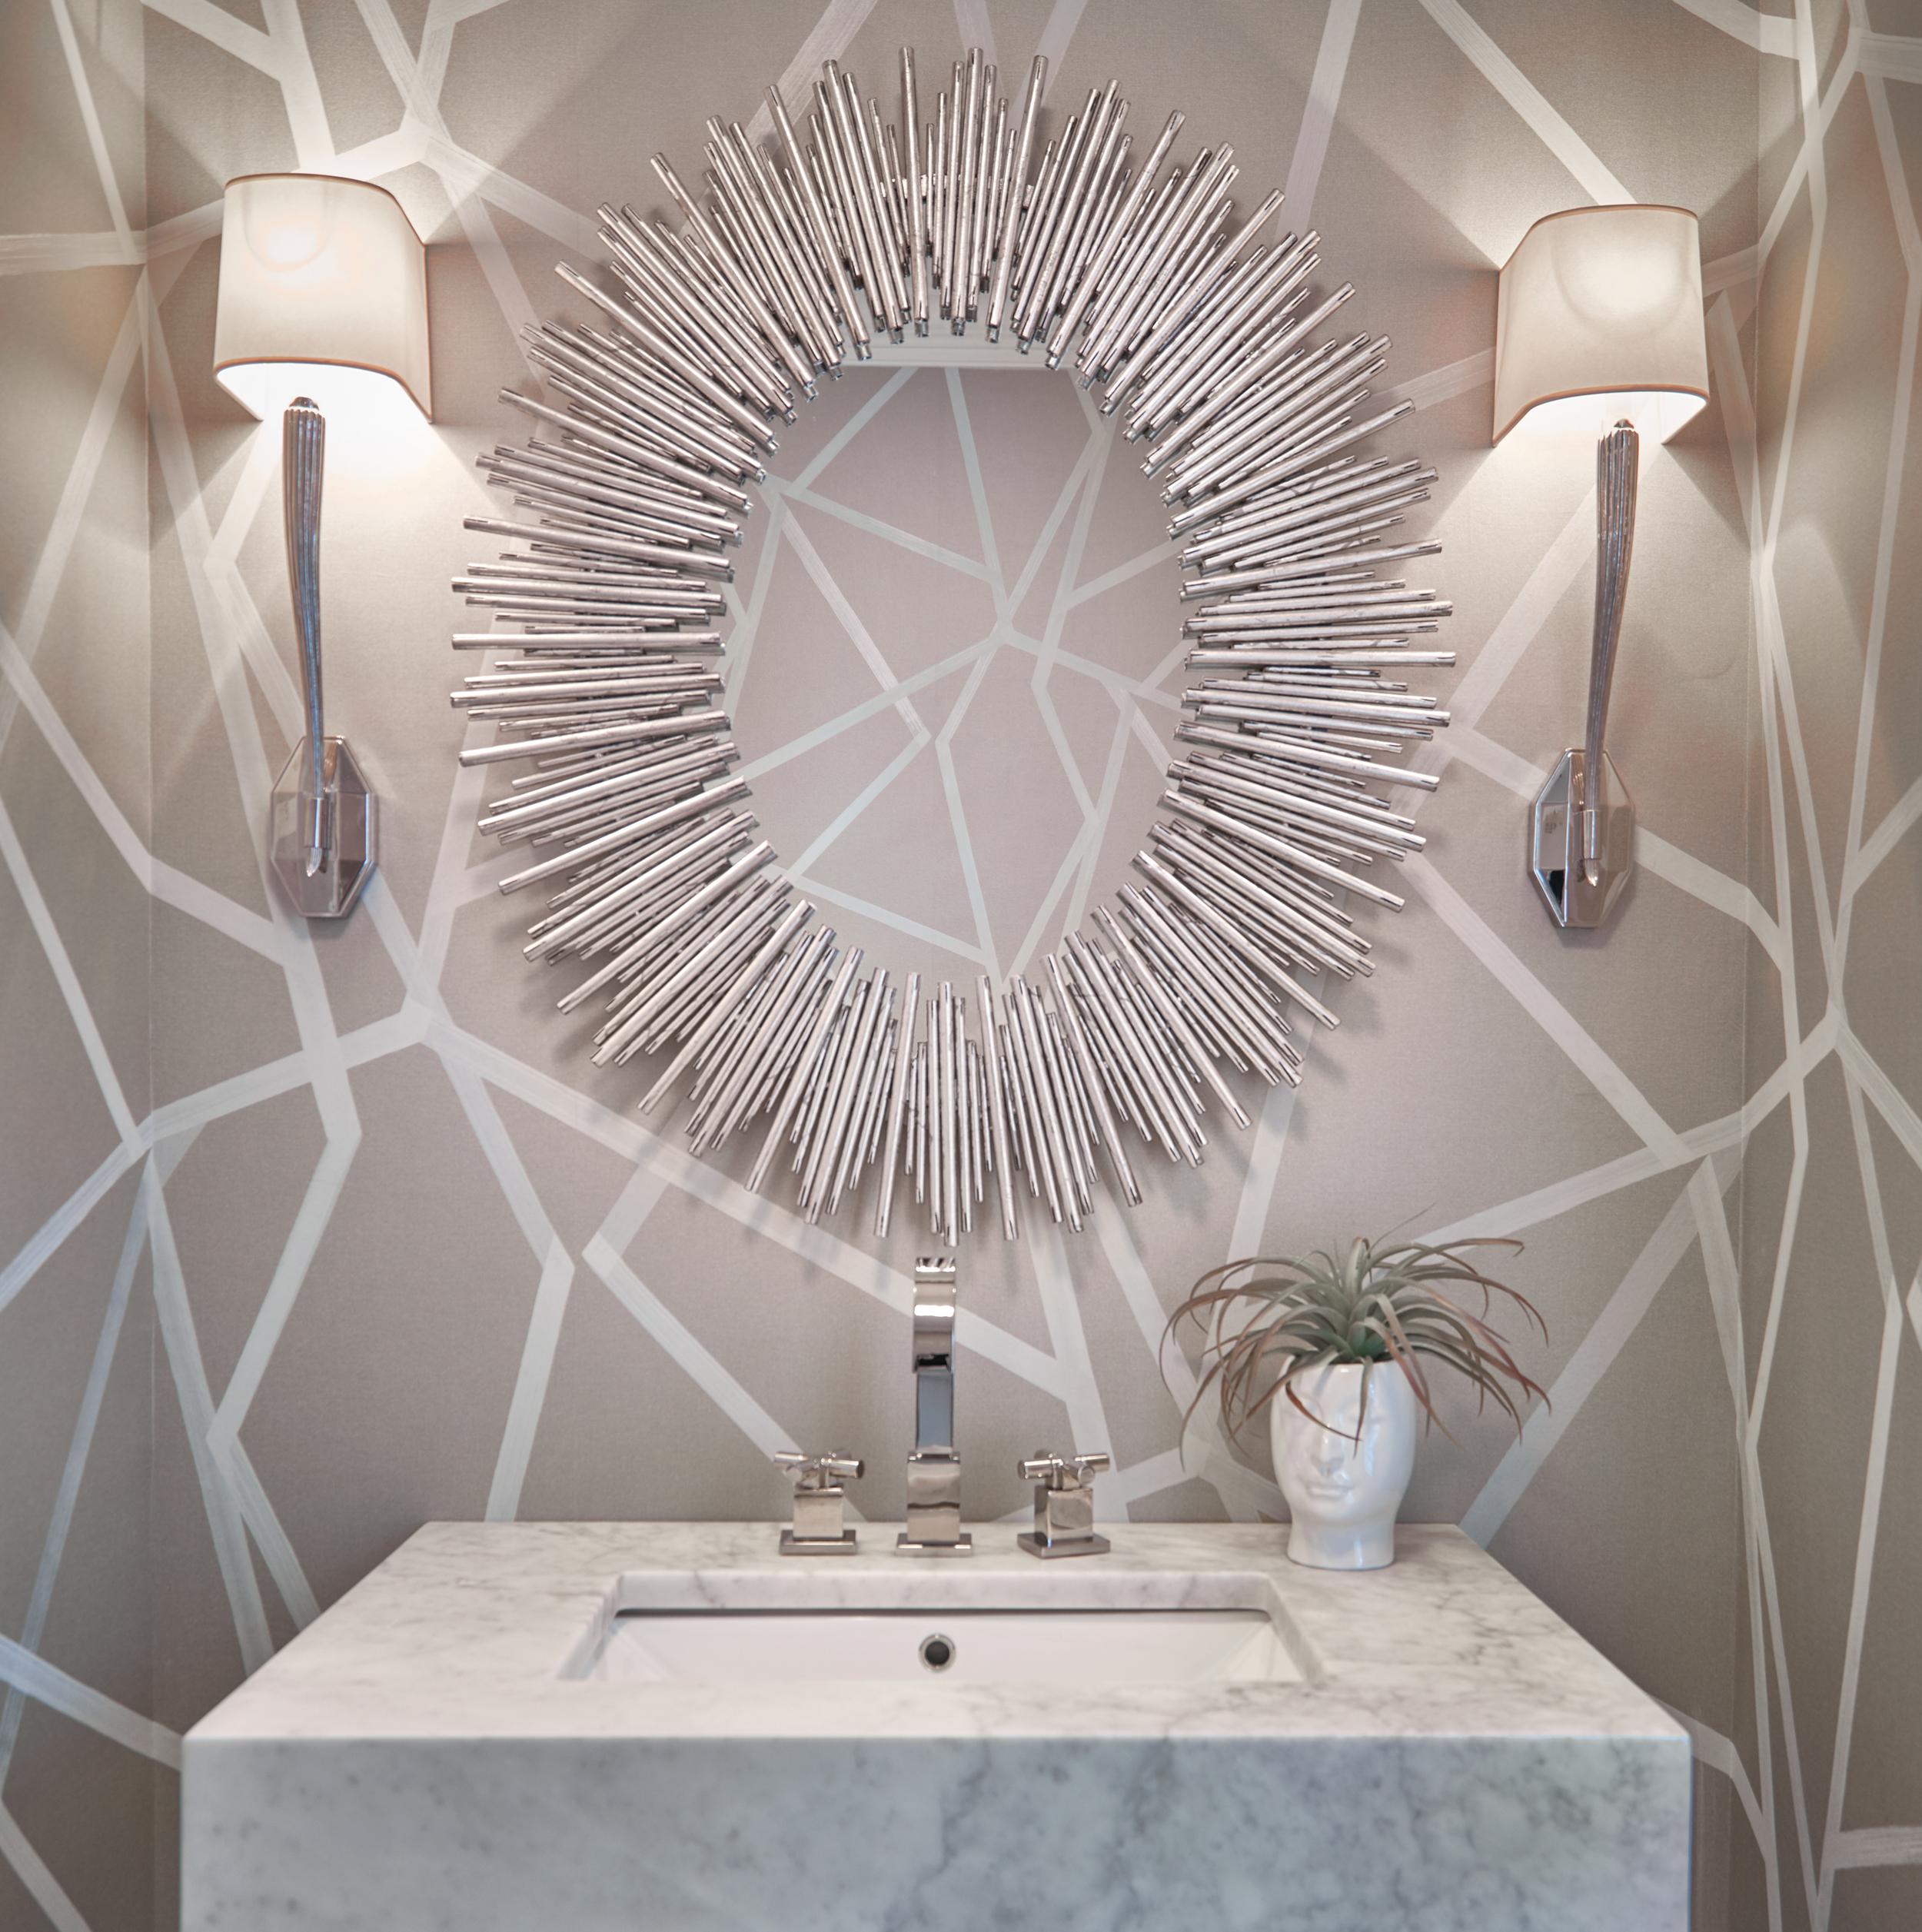 Abstract powder room